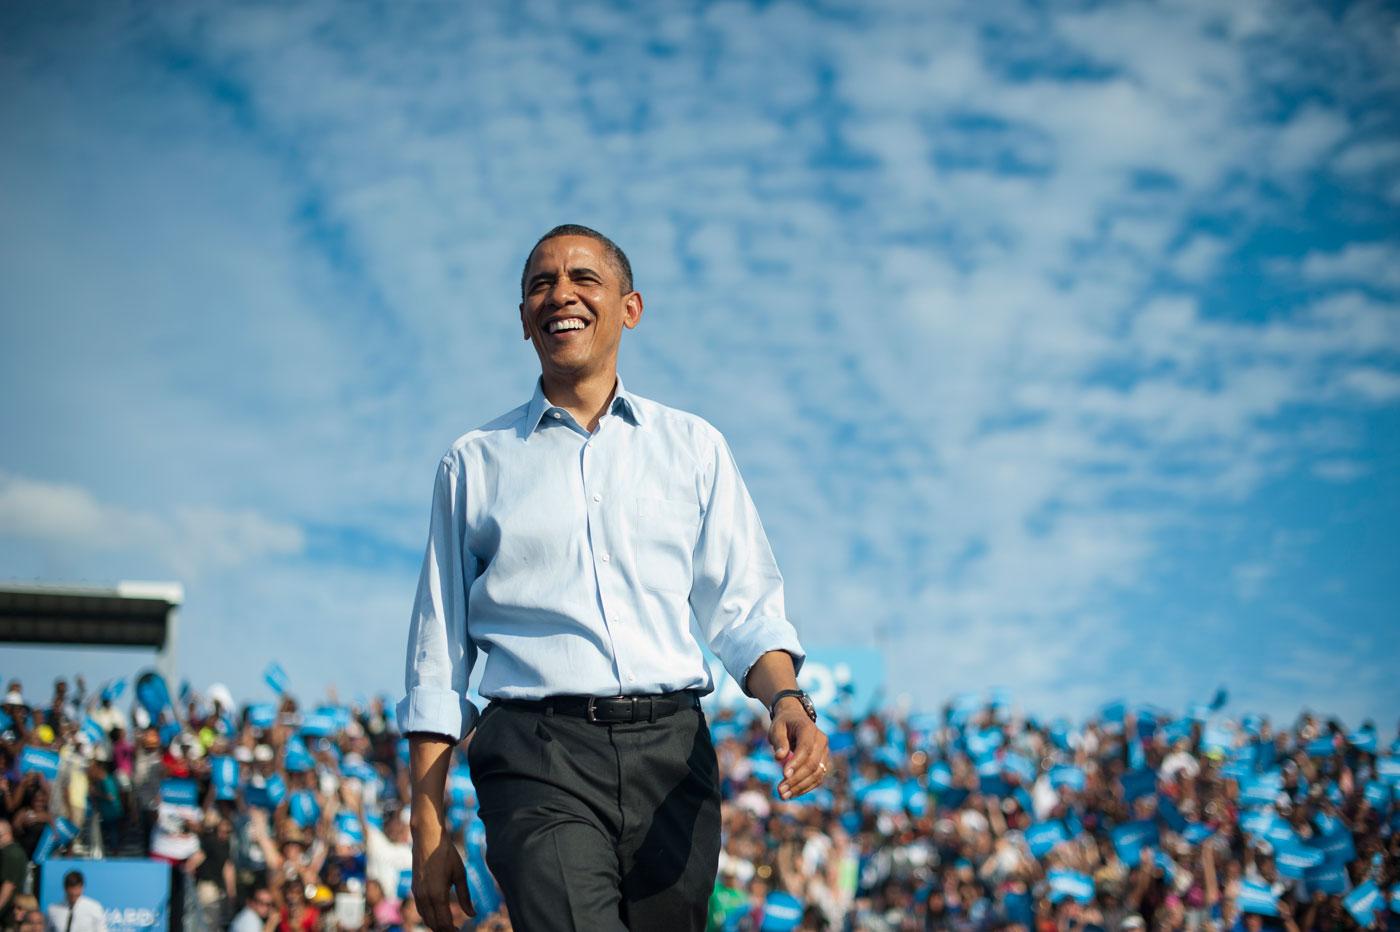 Barack Obama (c) Flickr.com/Scout Tufankjian for Obama for America/CC BY-NC-SA 2.0 Foto: Flickr.com/Scout Tufankjian for Obama for America/CC BY-NC-SA 2.0